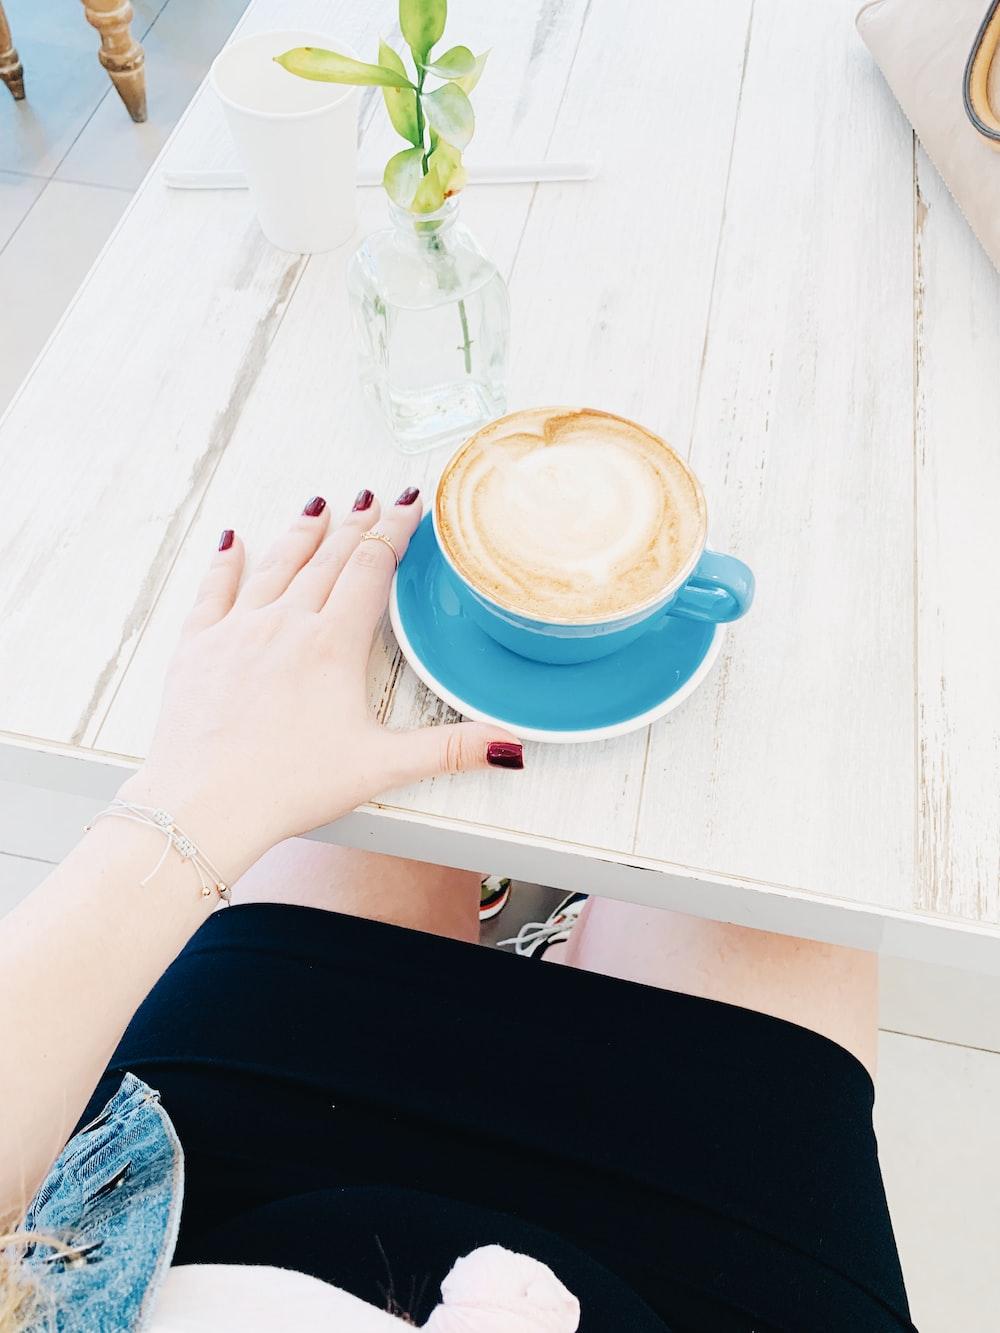 cappuccino in blue mug